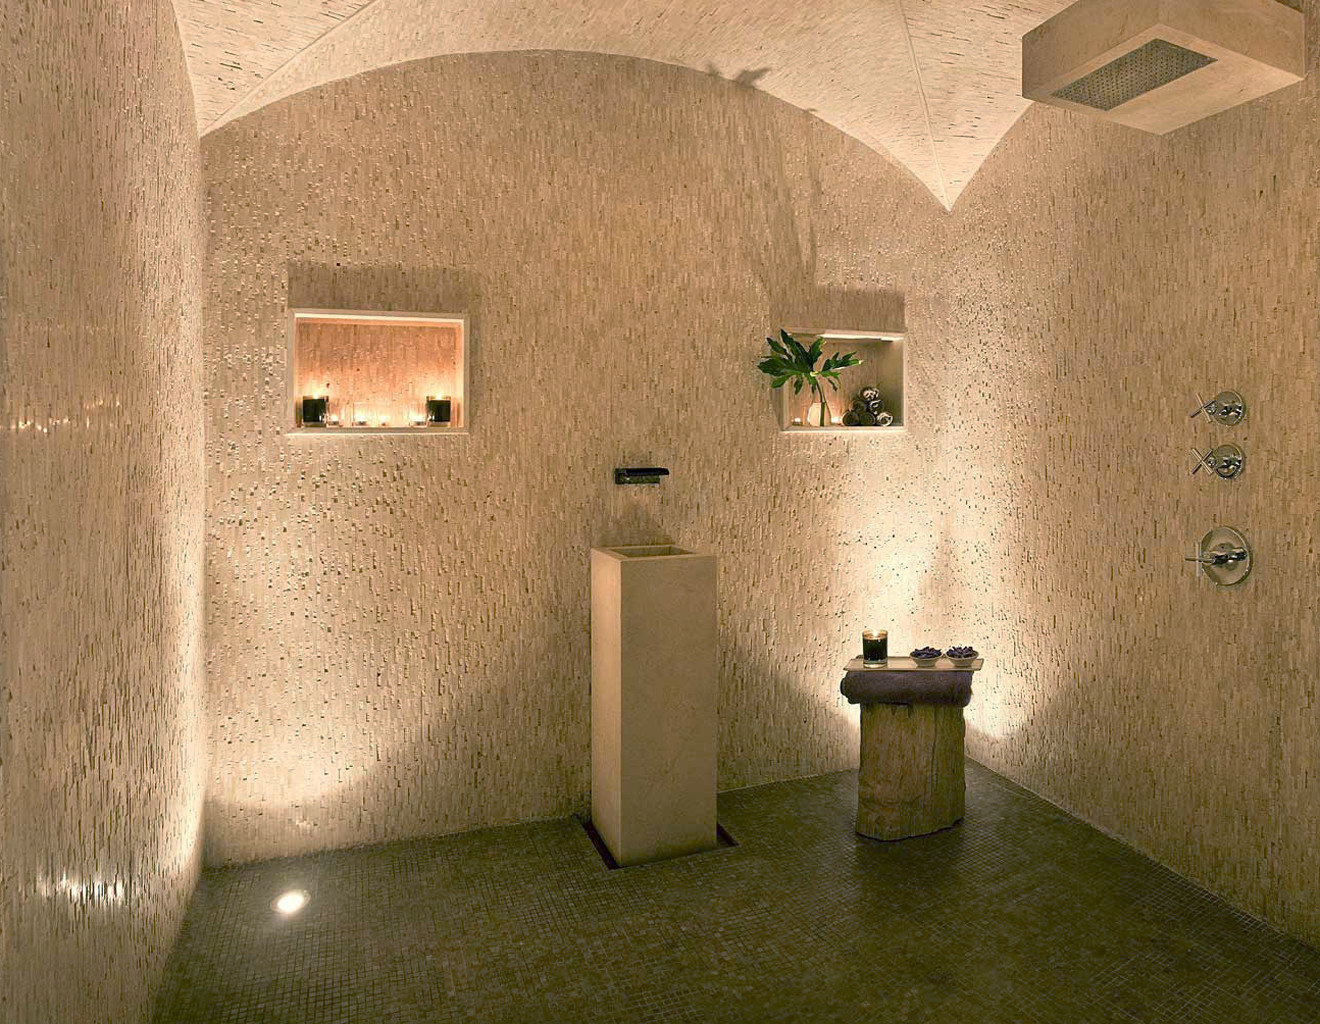 Luxury Romance Romantic Spa Wellness bathroom house plumbing fixture public toilet